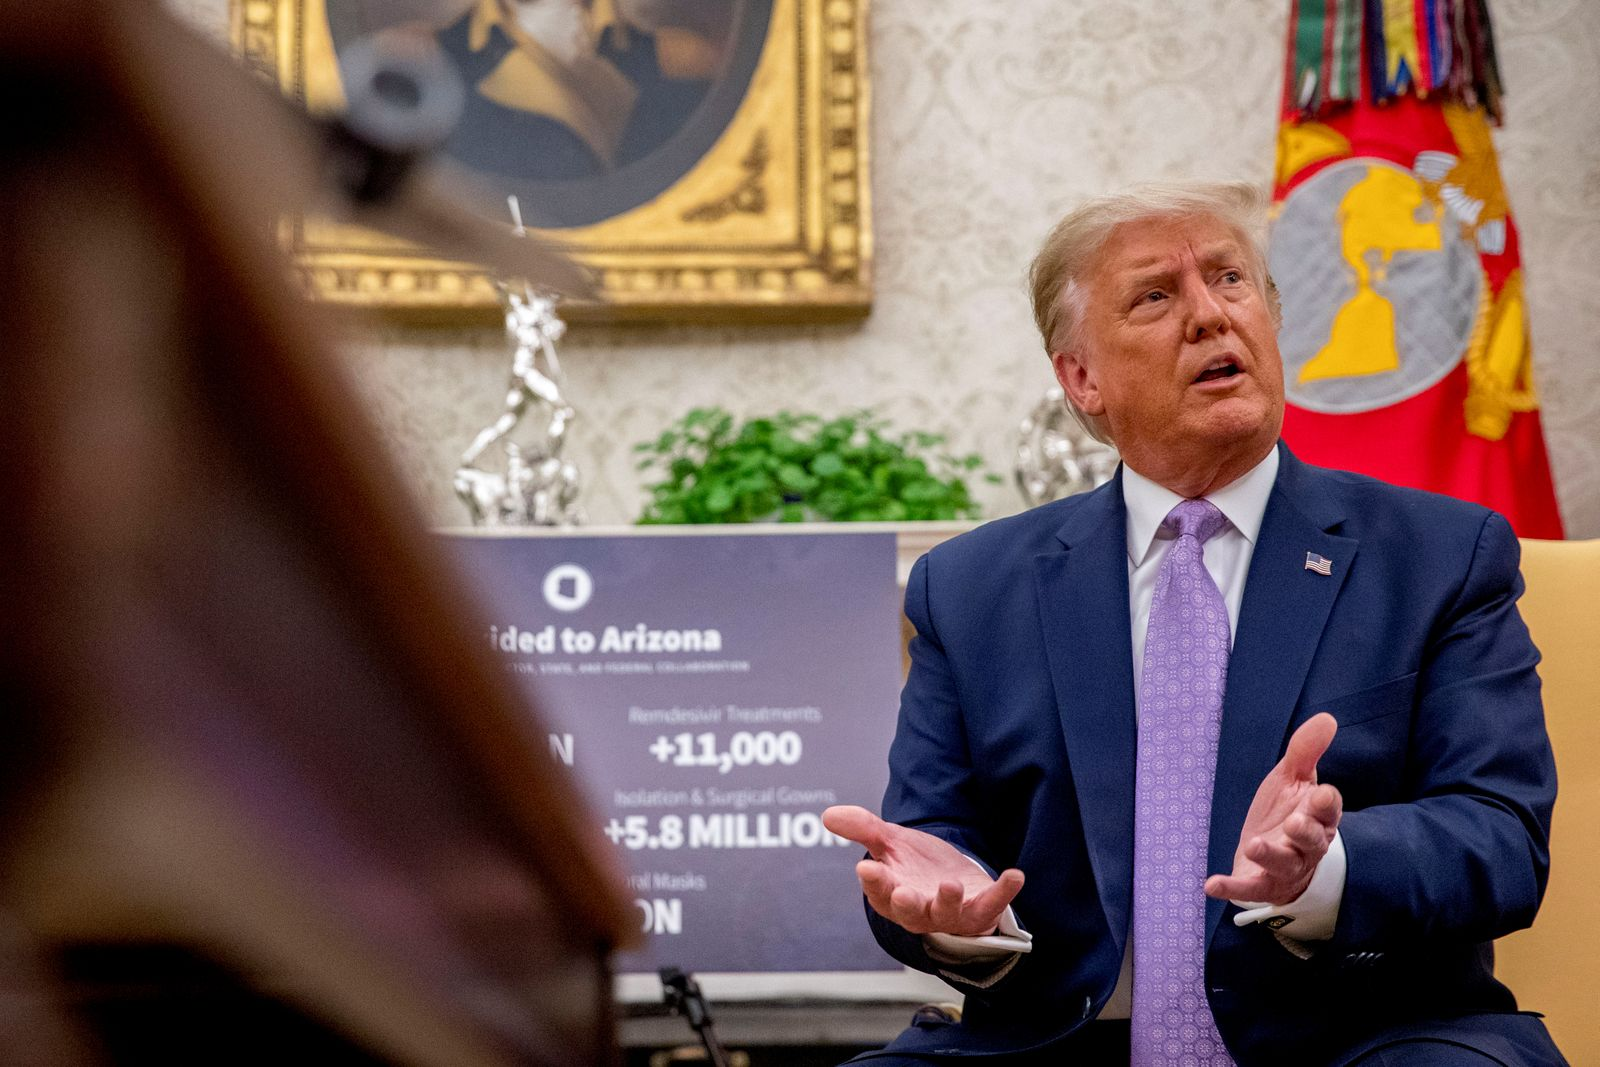 U.S. President Trump meets with Arizona Governor Ducey in Washington